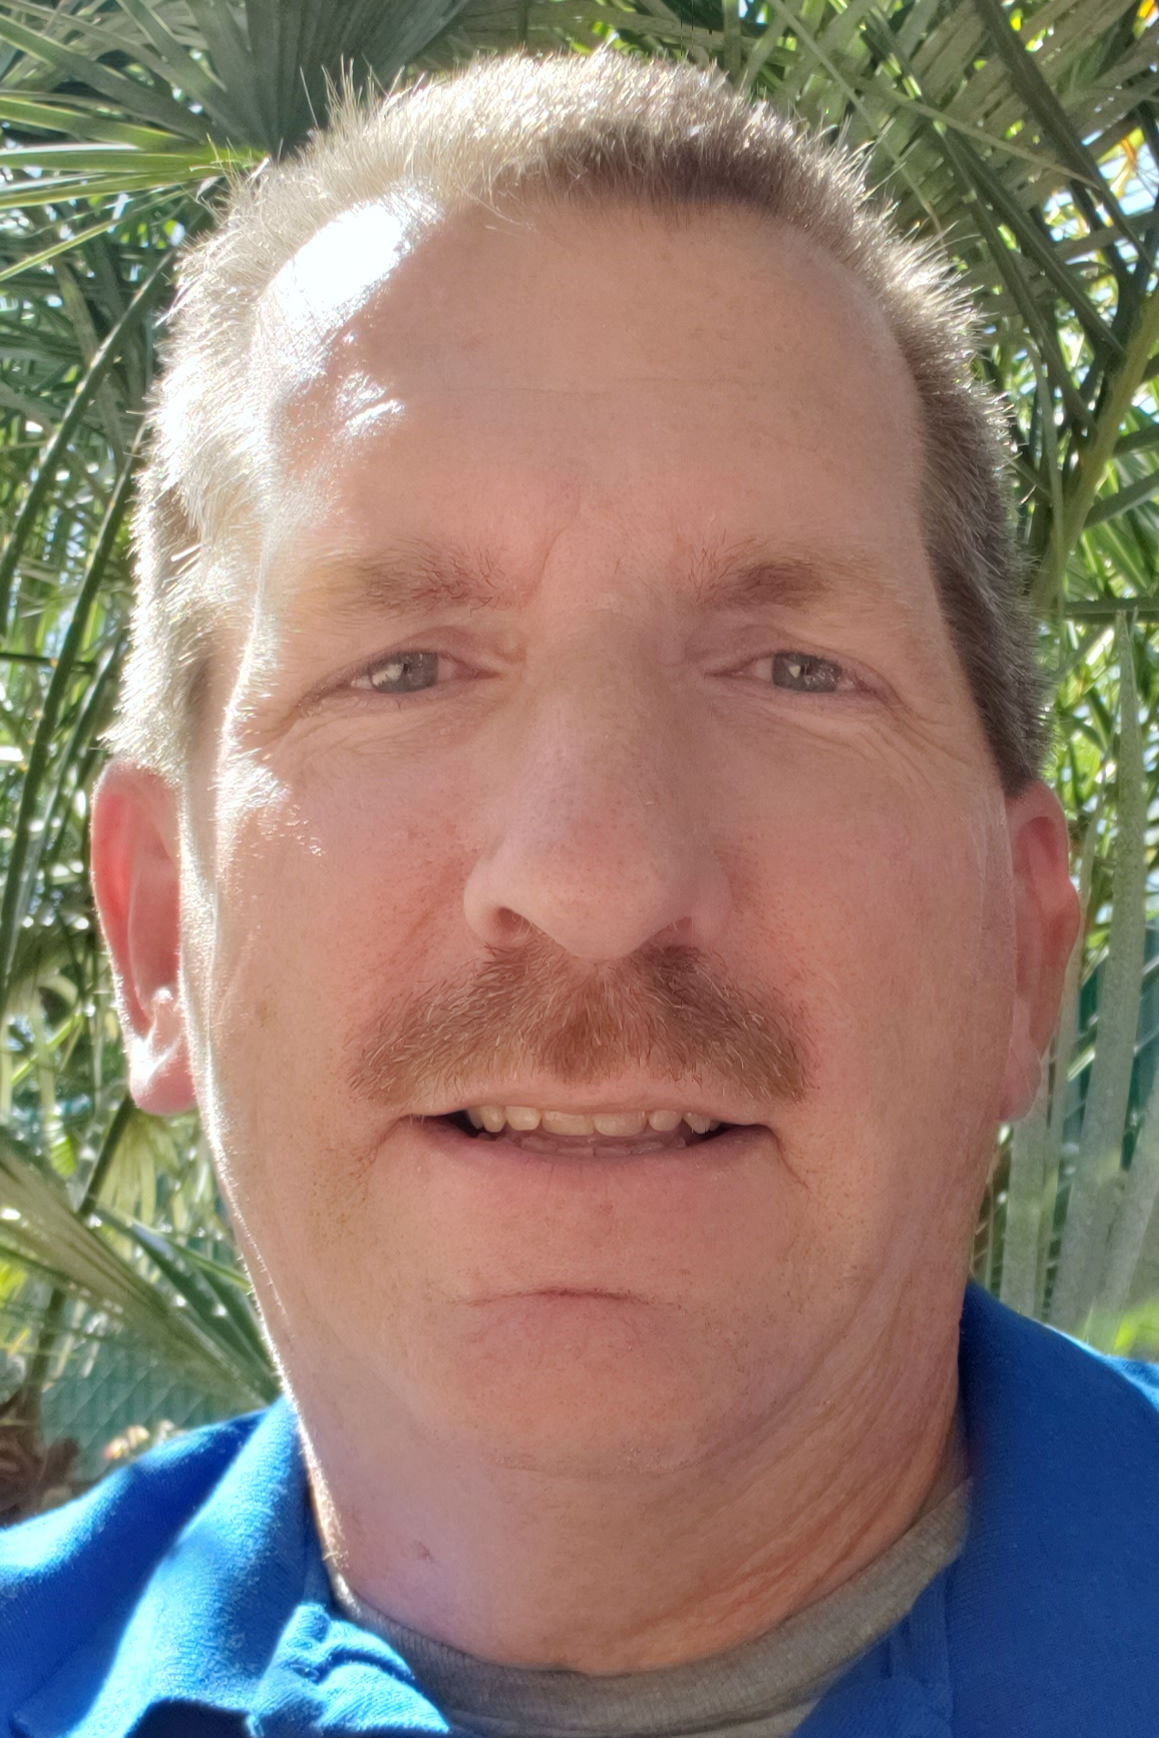 2020 Elections: Brian Radford, Pima County Supervisor